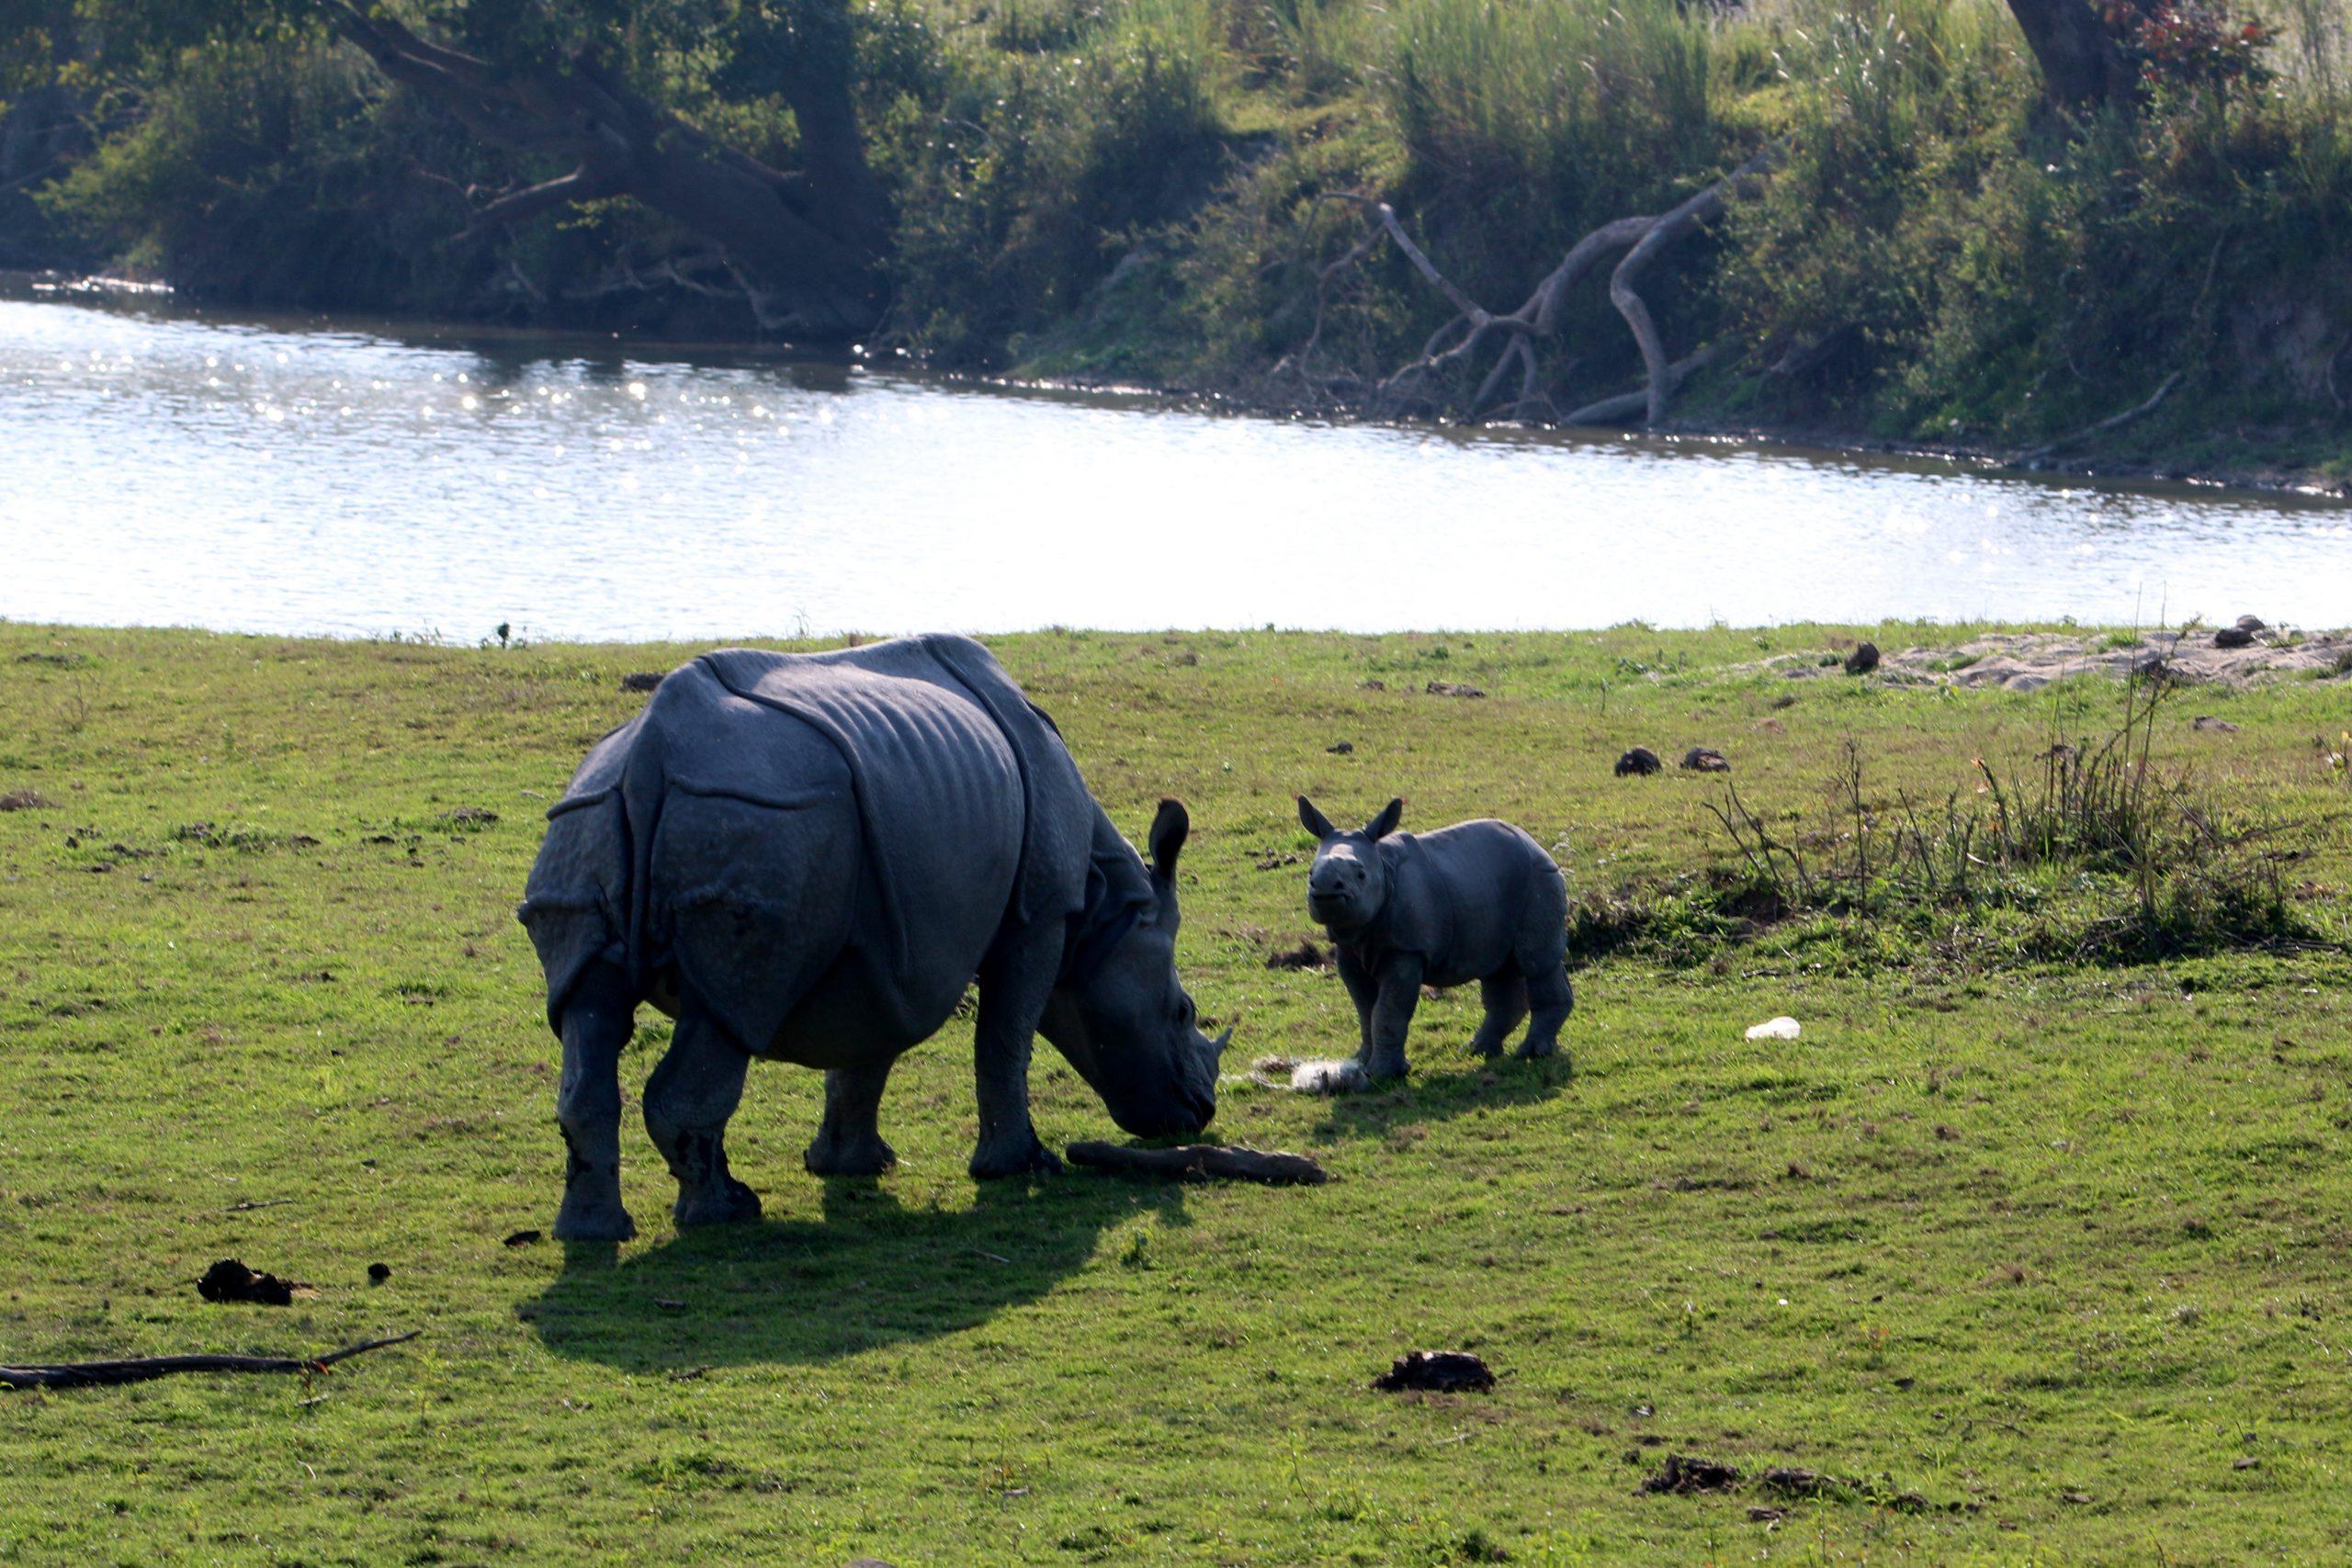 Rhino near the river